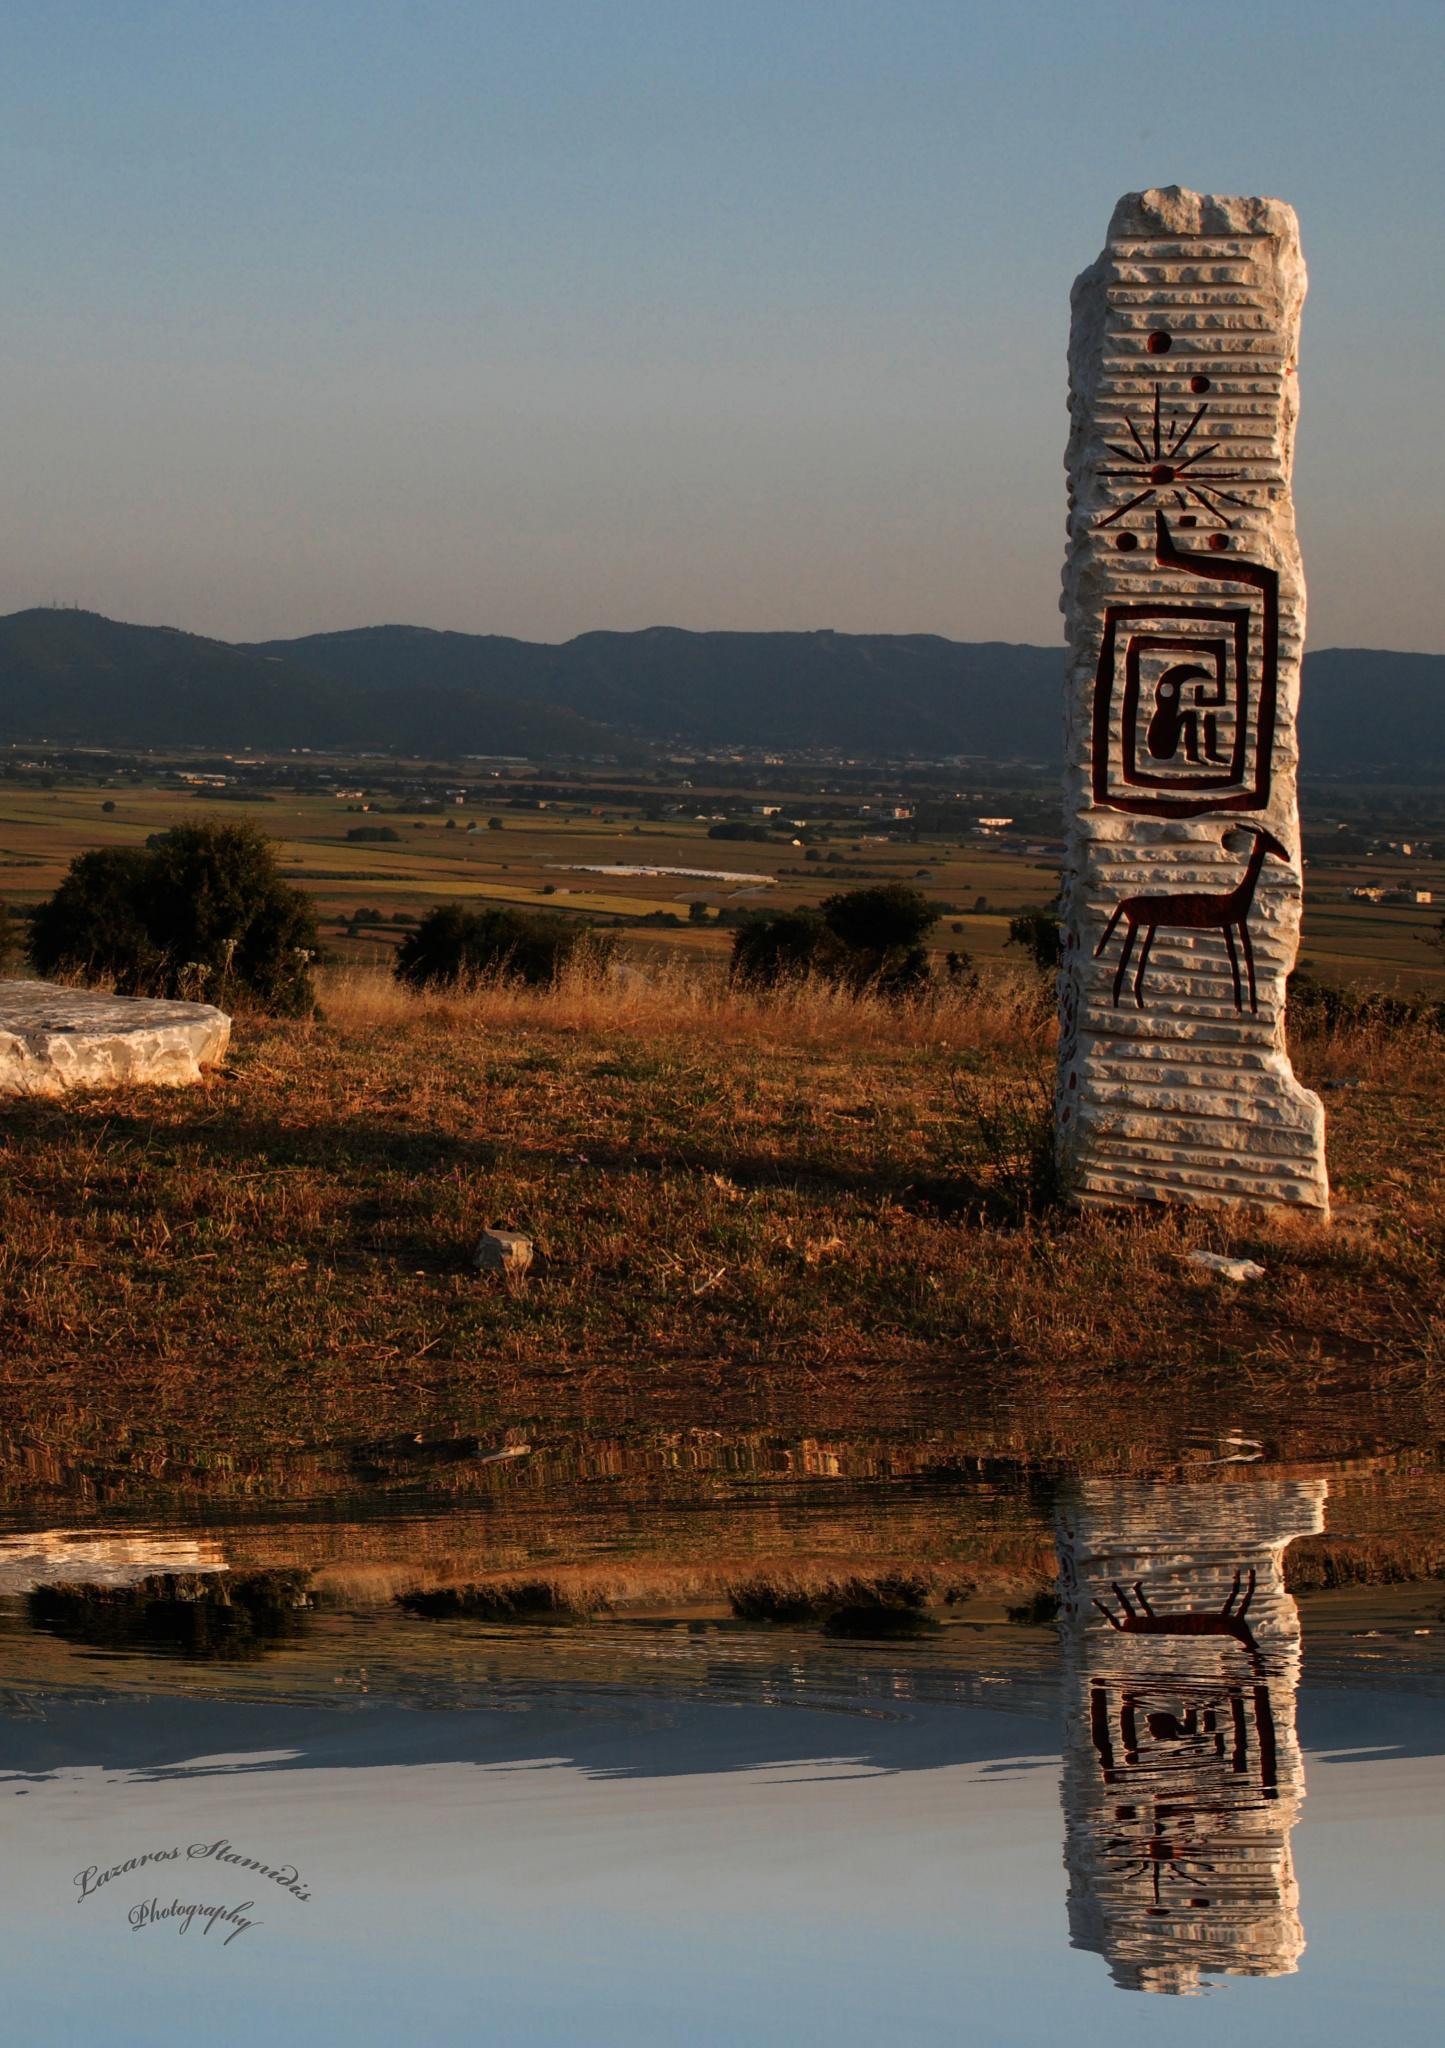 Philippi, Greece by lazarosstamidis